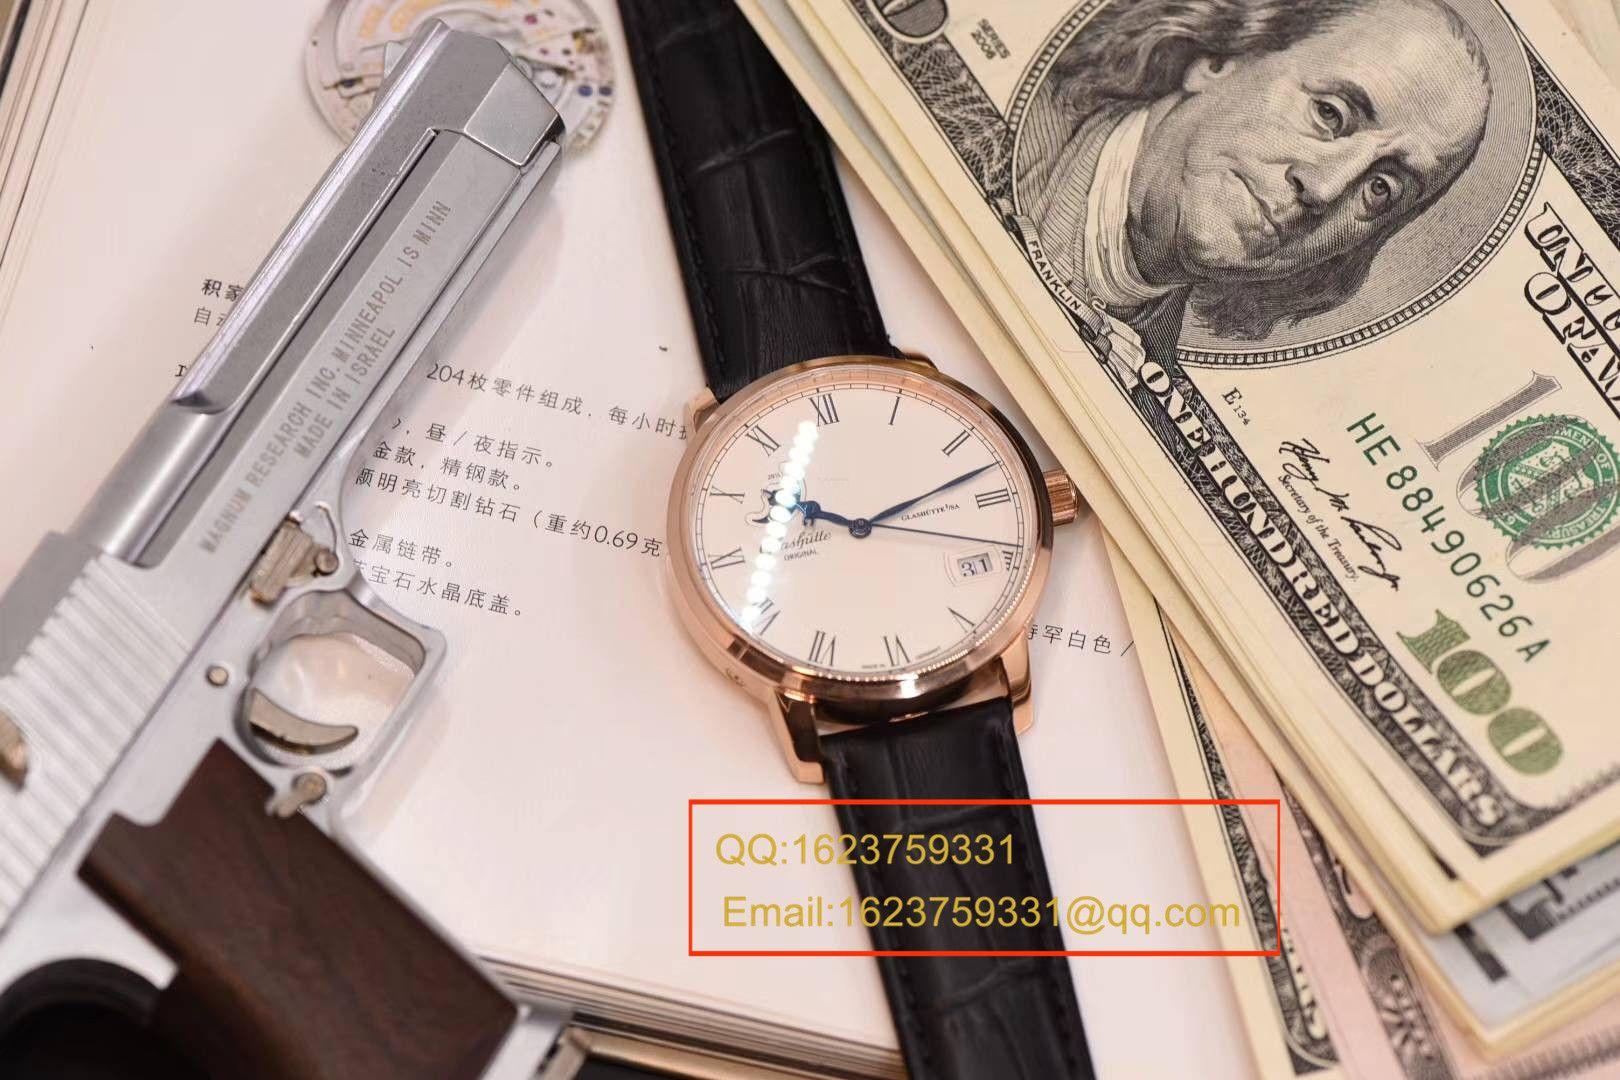 【GF厂顶级复刻手表】格拉苏蒂原创精髓议员大日历月相腕表系列 100-04-32-15-04腕表 / GLABA013